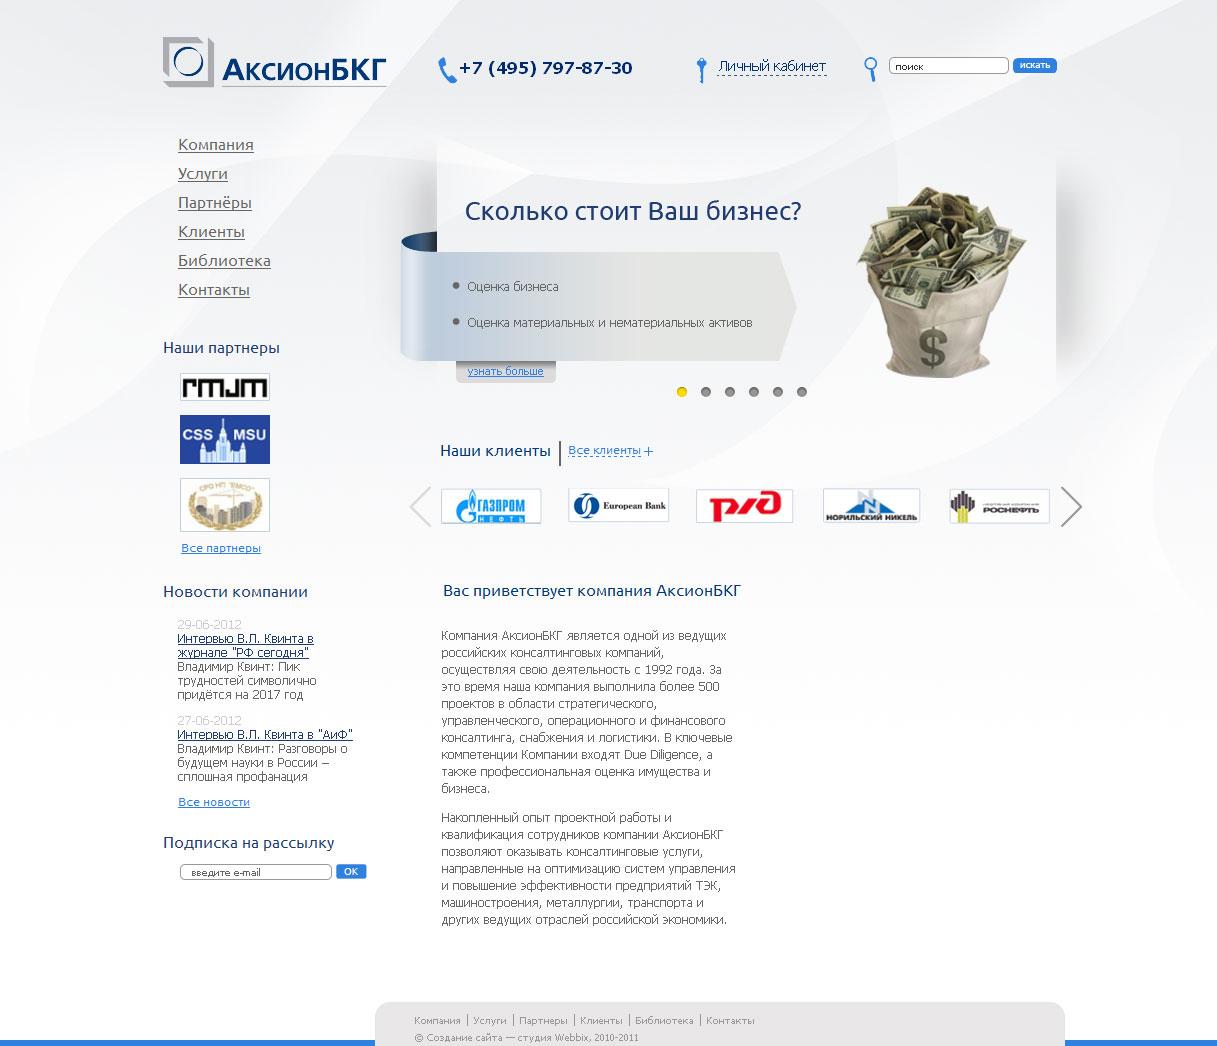 Компания АксионБКГ